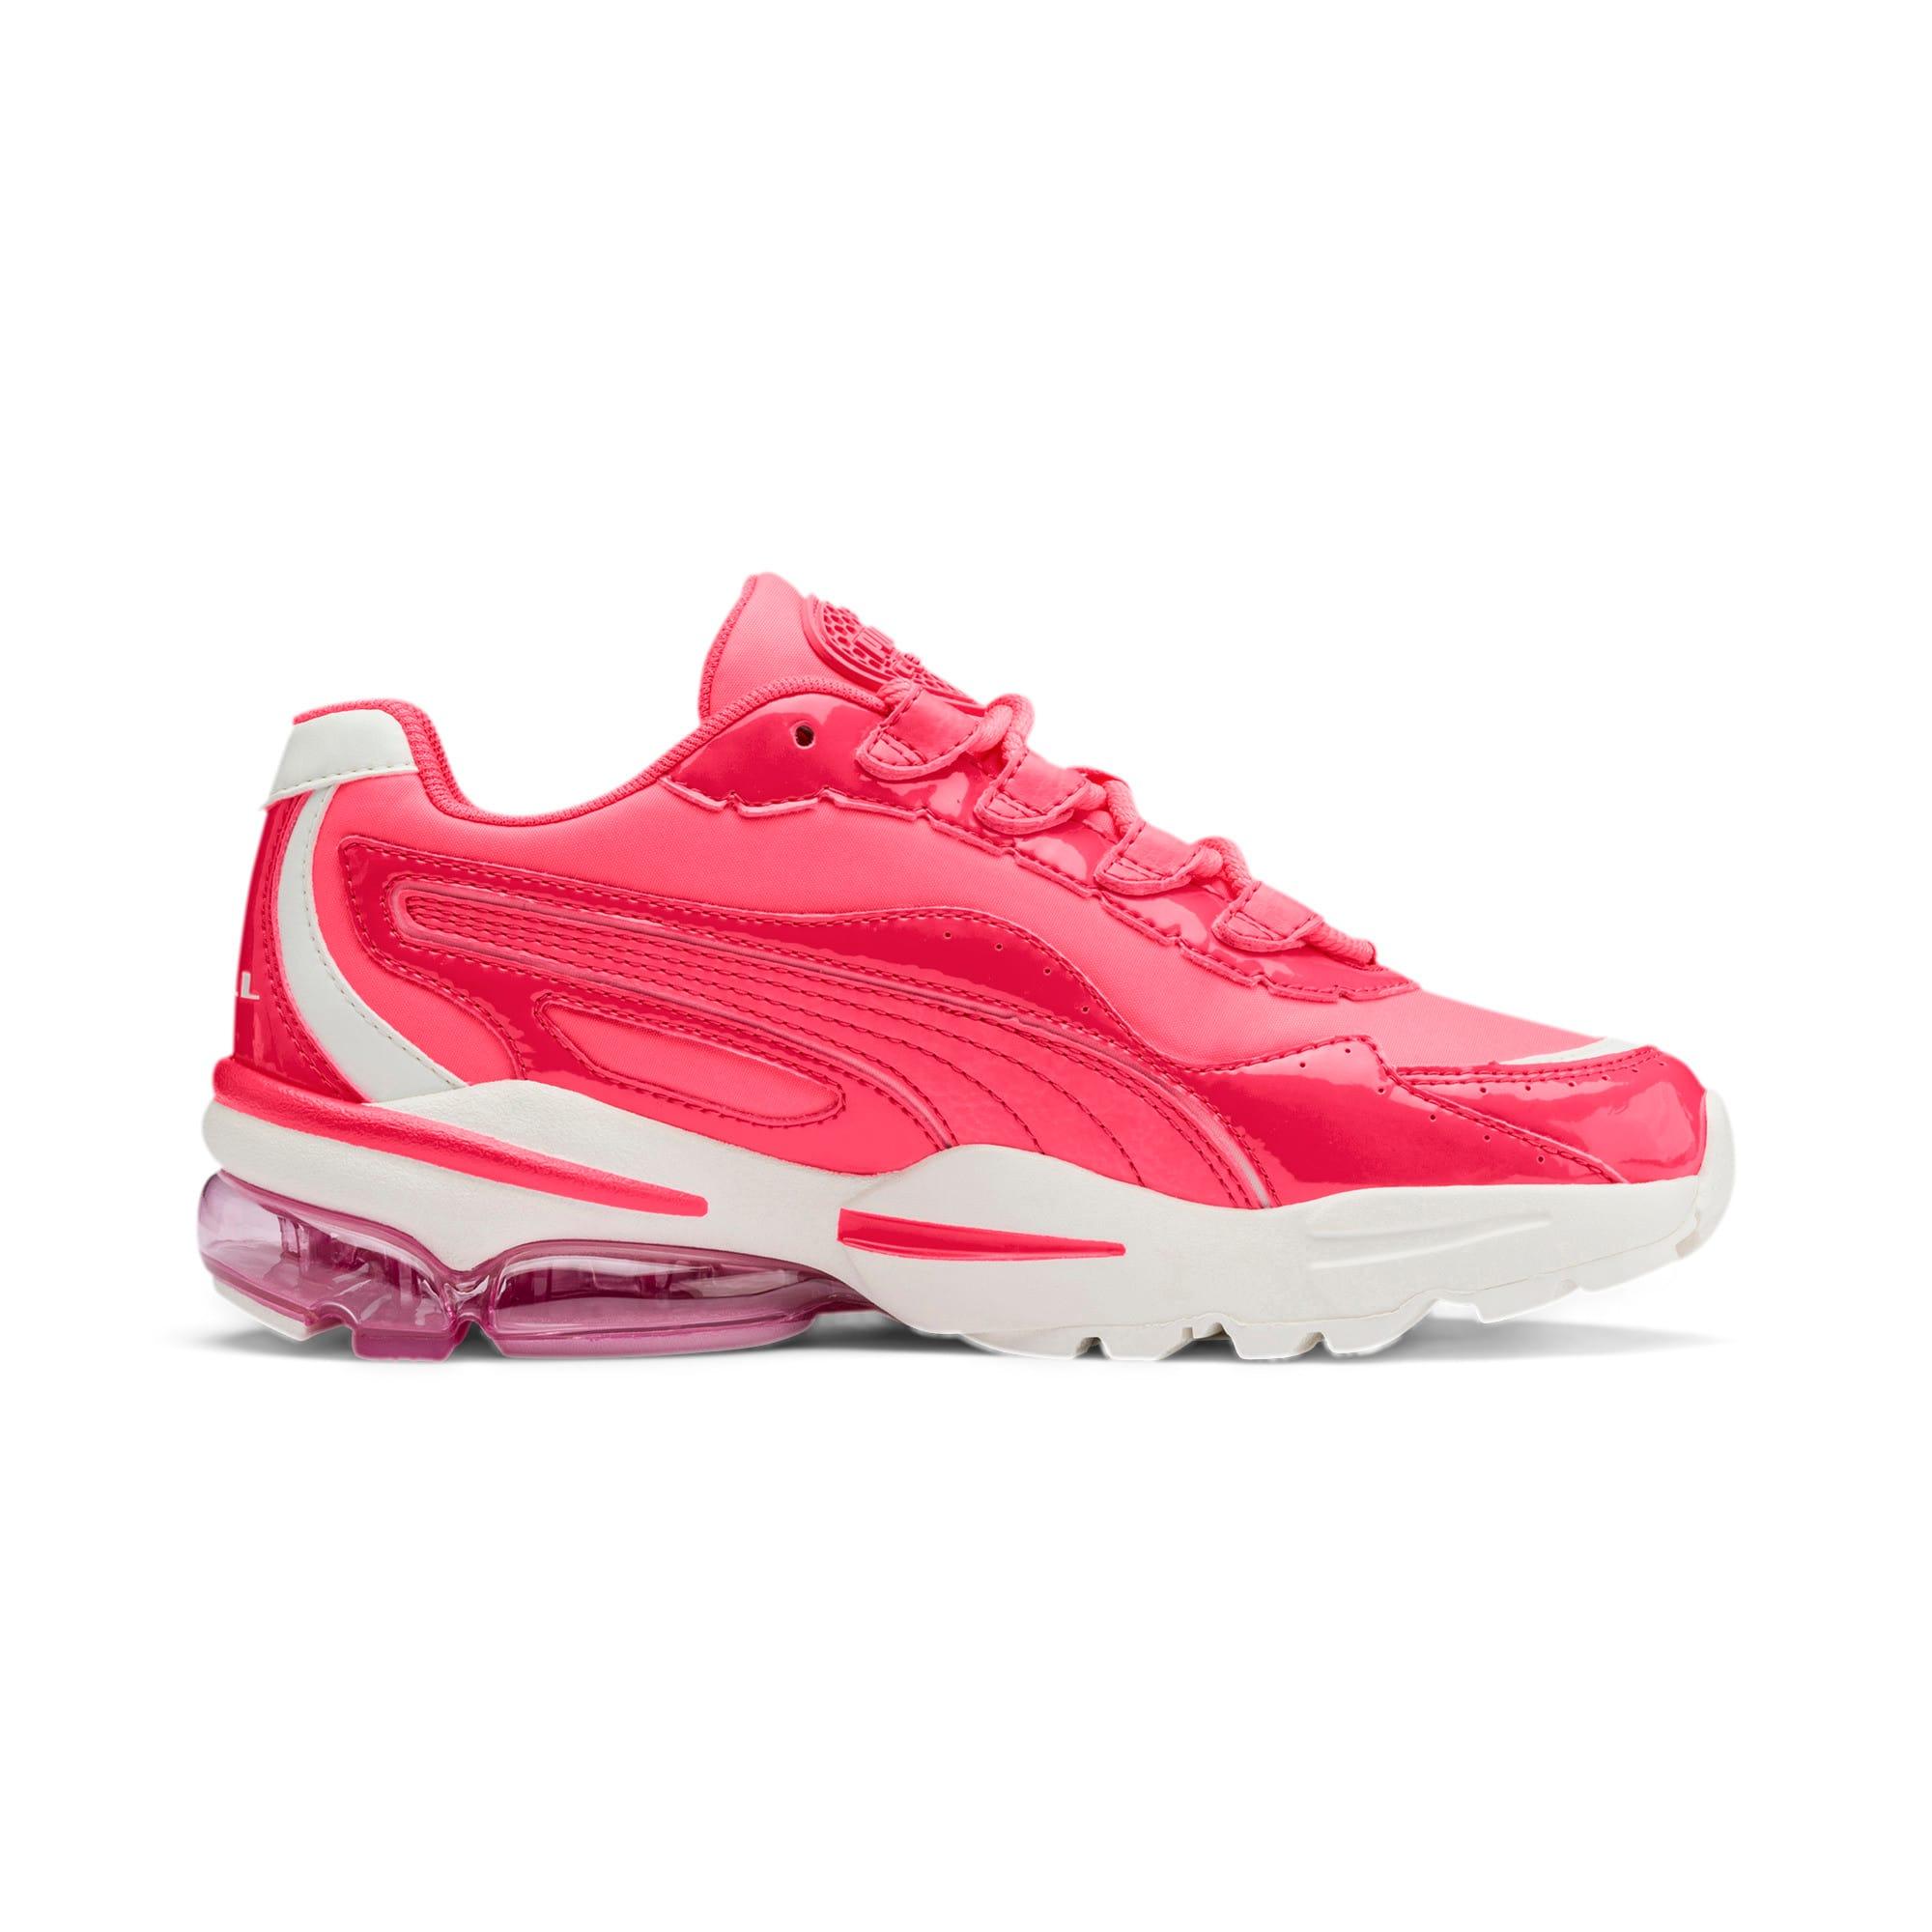 Thumbnail 6 of CELL Stellar Neon Women's Sneakers, Pink Alert-Heather, medium